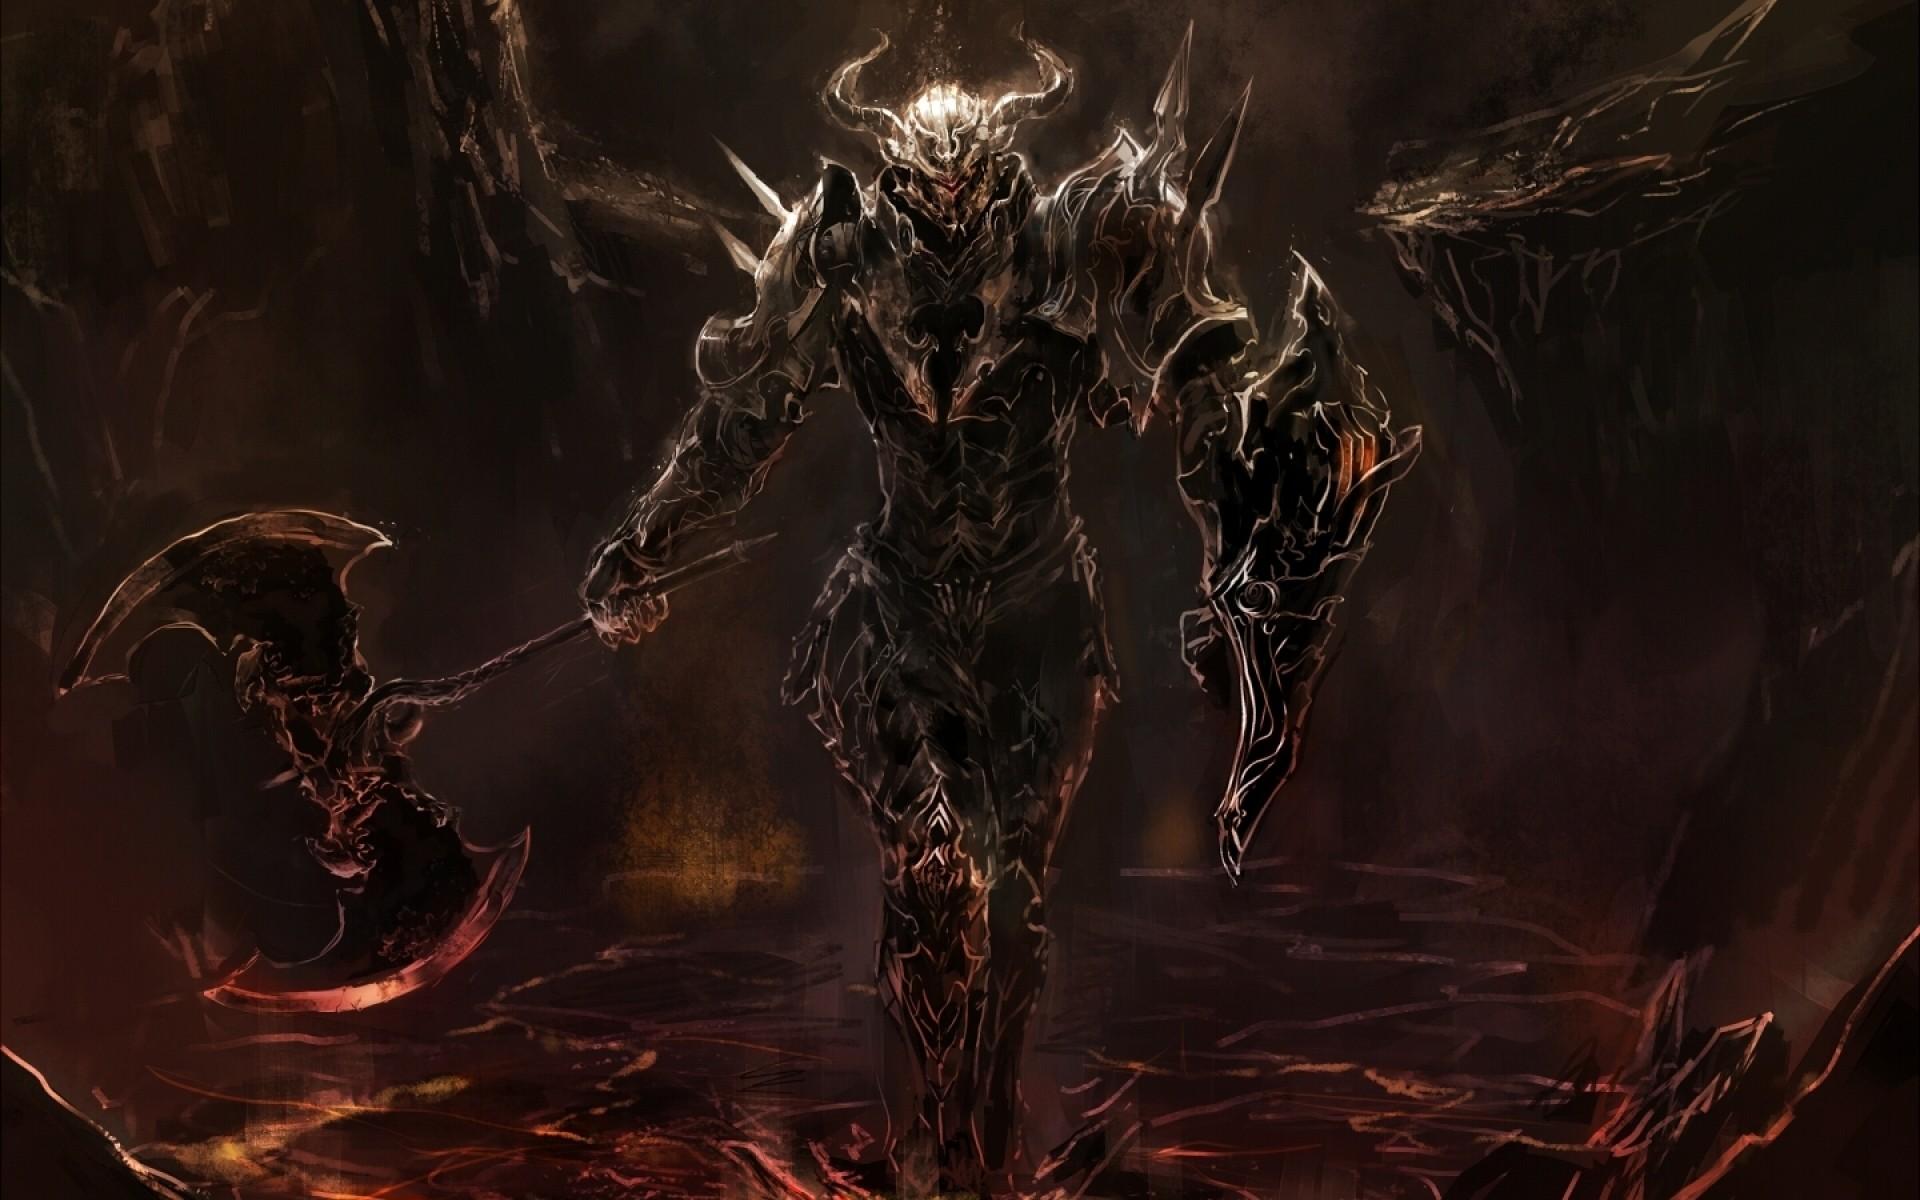 Fantasy Art Dark Knight Artwork Warrior Death Demon Lava Medieval Mythology Darkness Screenshot Computer Wallpaper Fictional